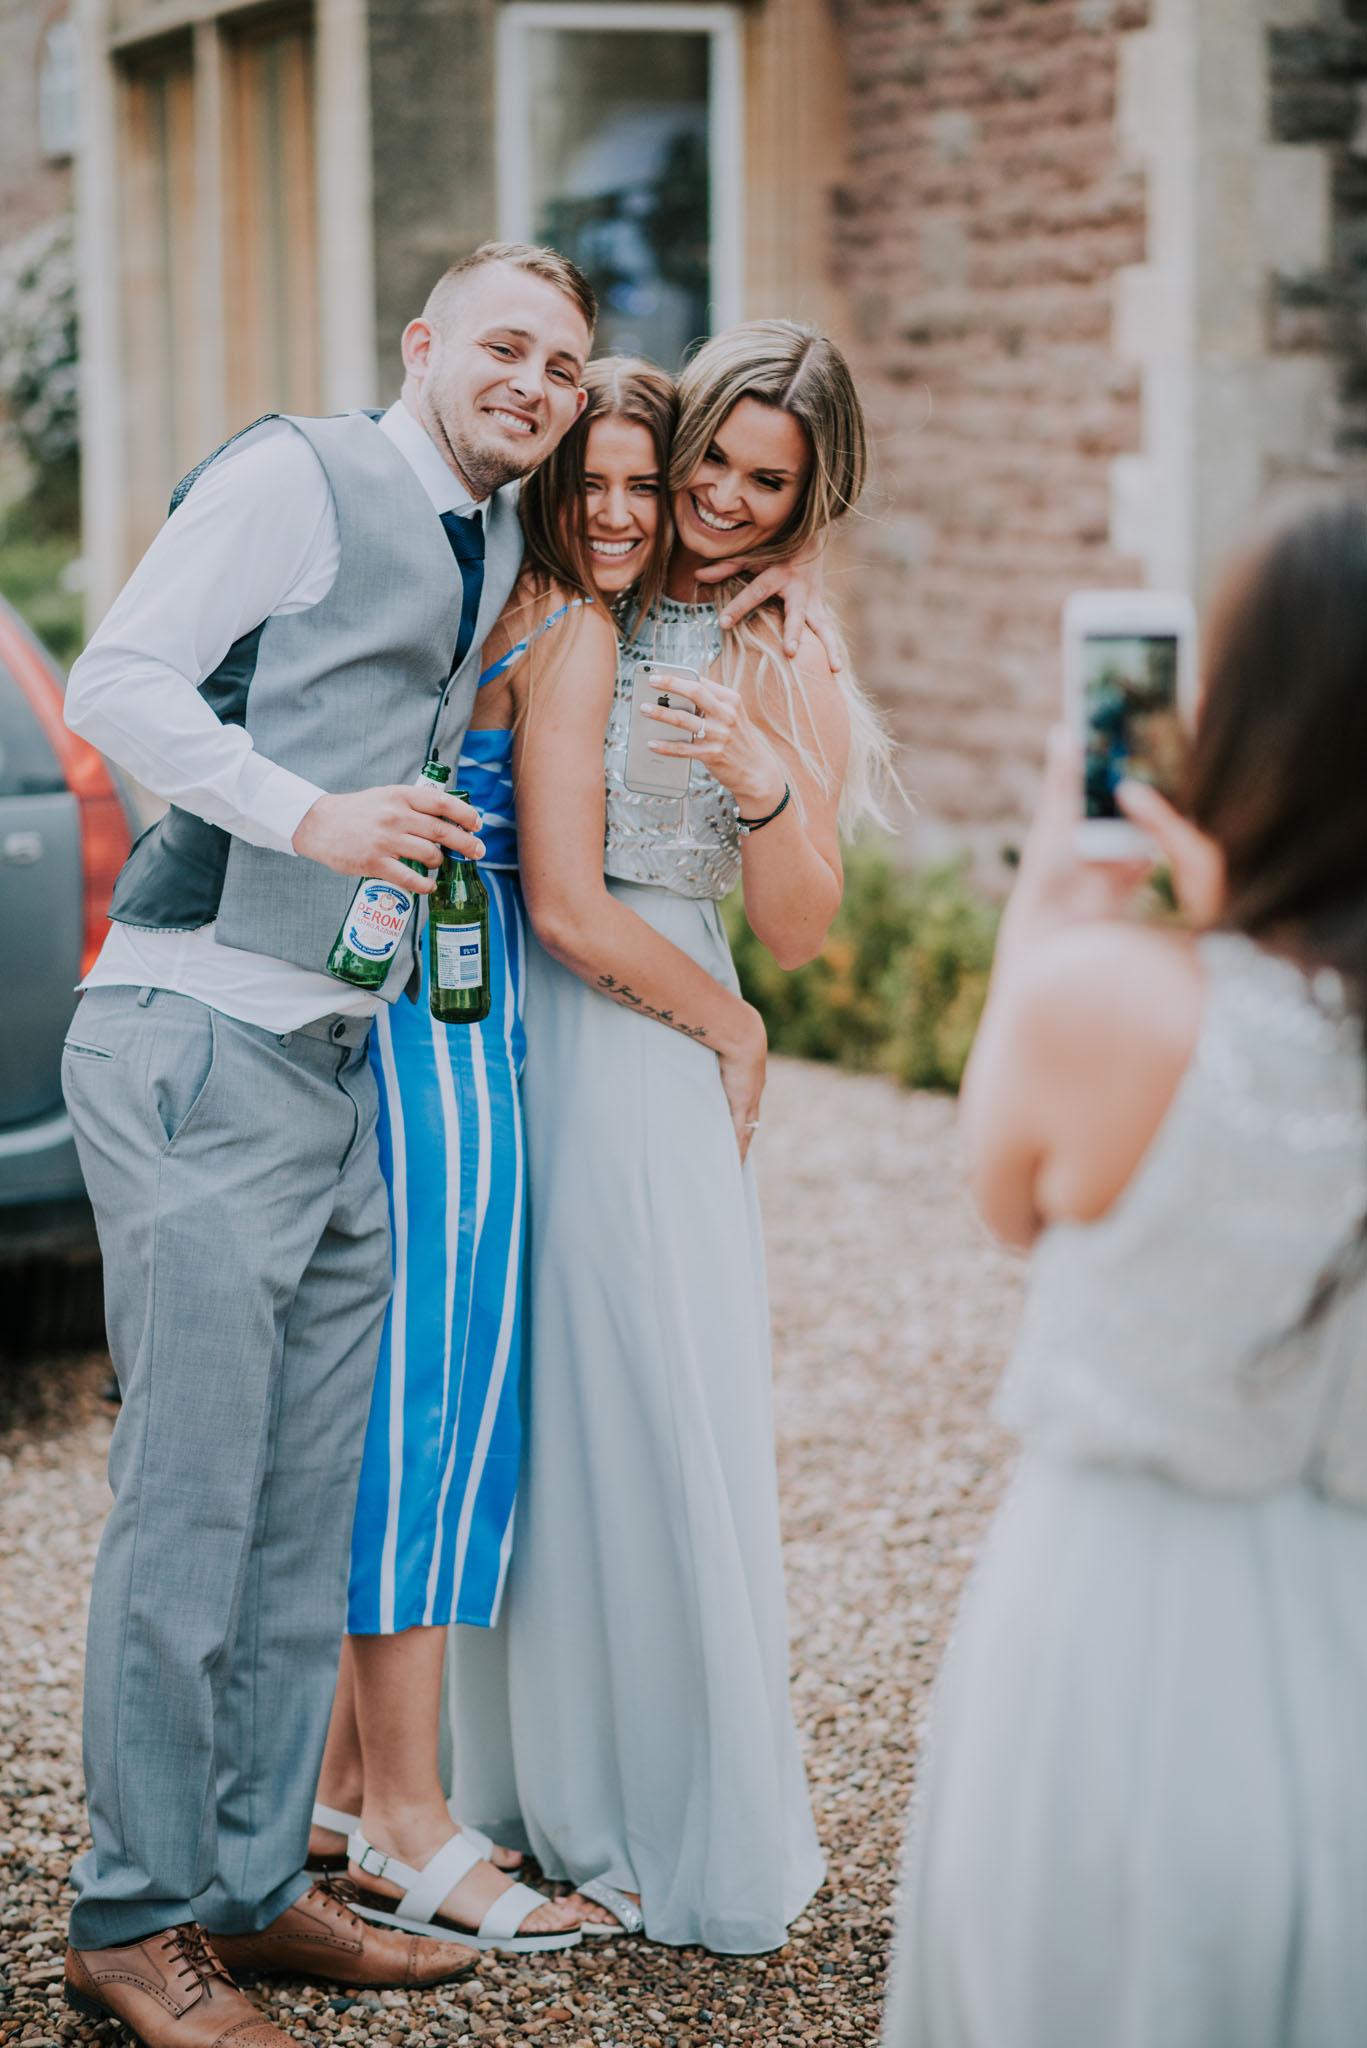 wedding-photographer-glewstone-court-hereford-scott-stockwell-photography398.jpg